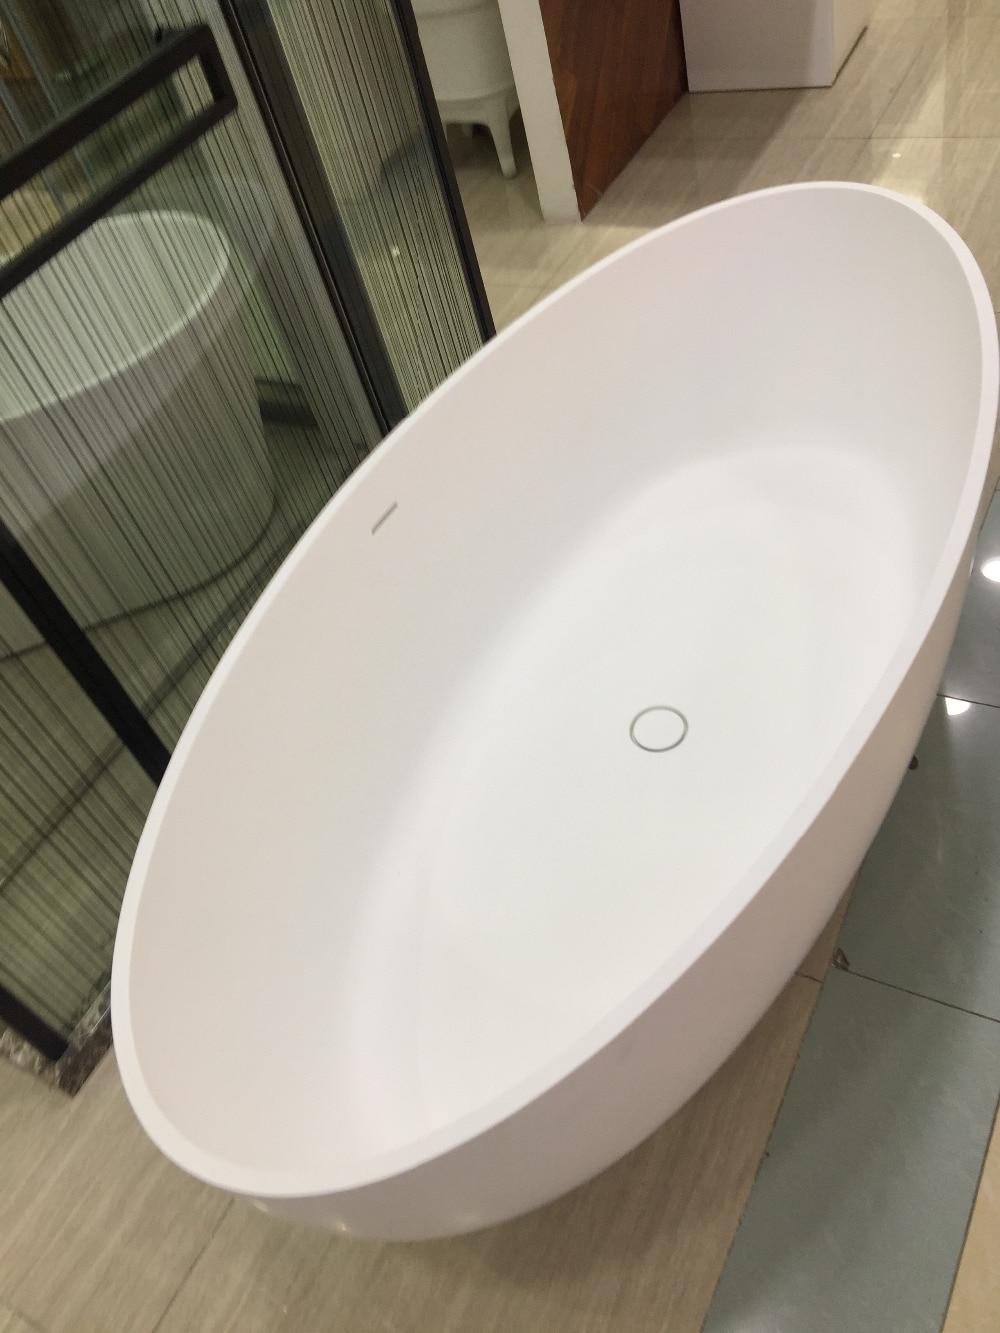 1700x800x480mm Solid Surface Acrylic CUPC Approval Bathtub Rectangular Freestanding Corian Matt Tub RS6589